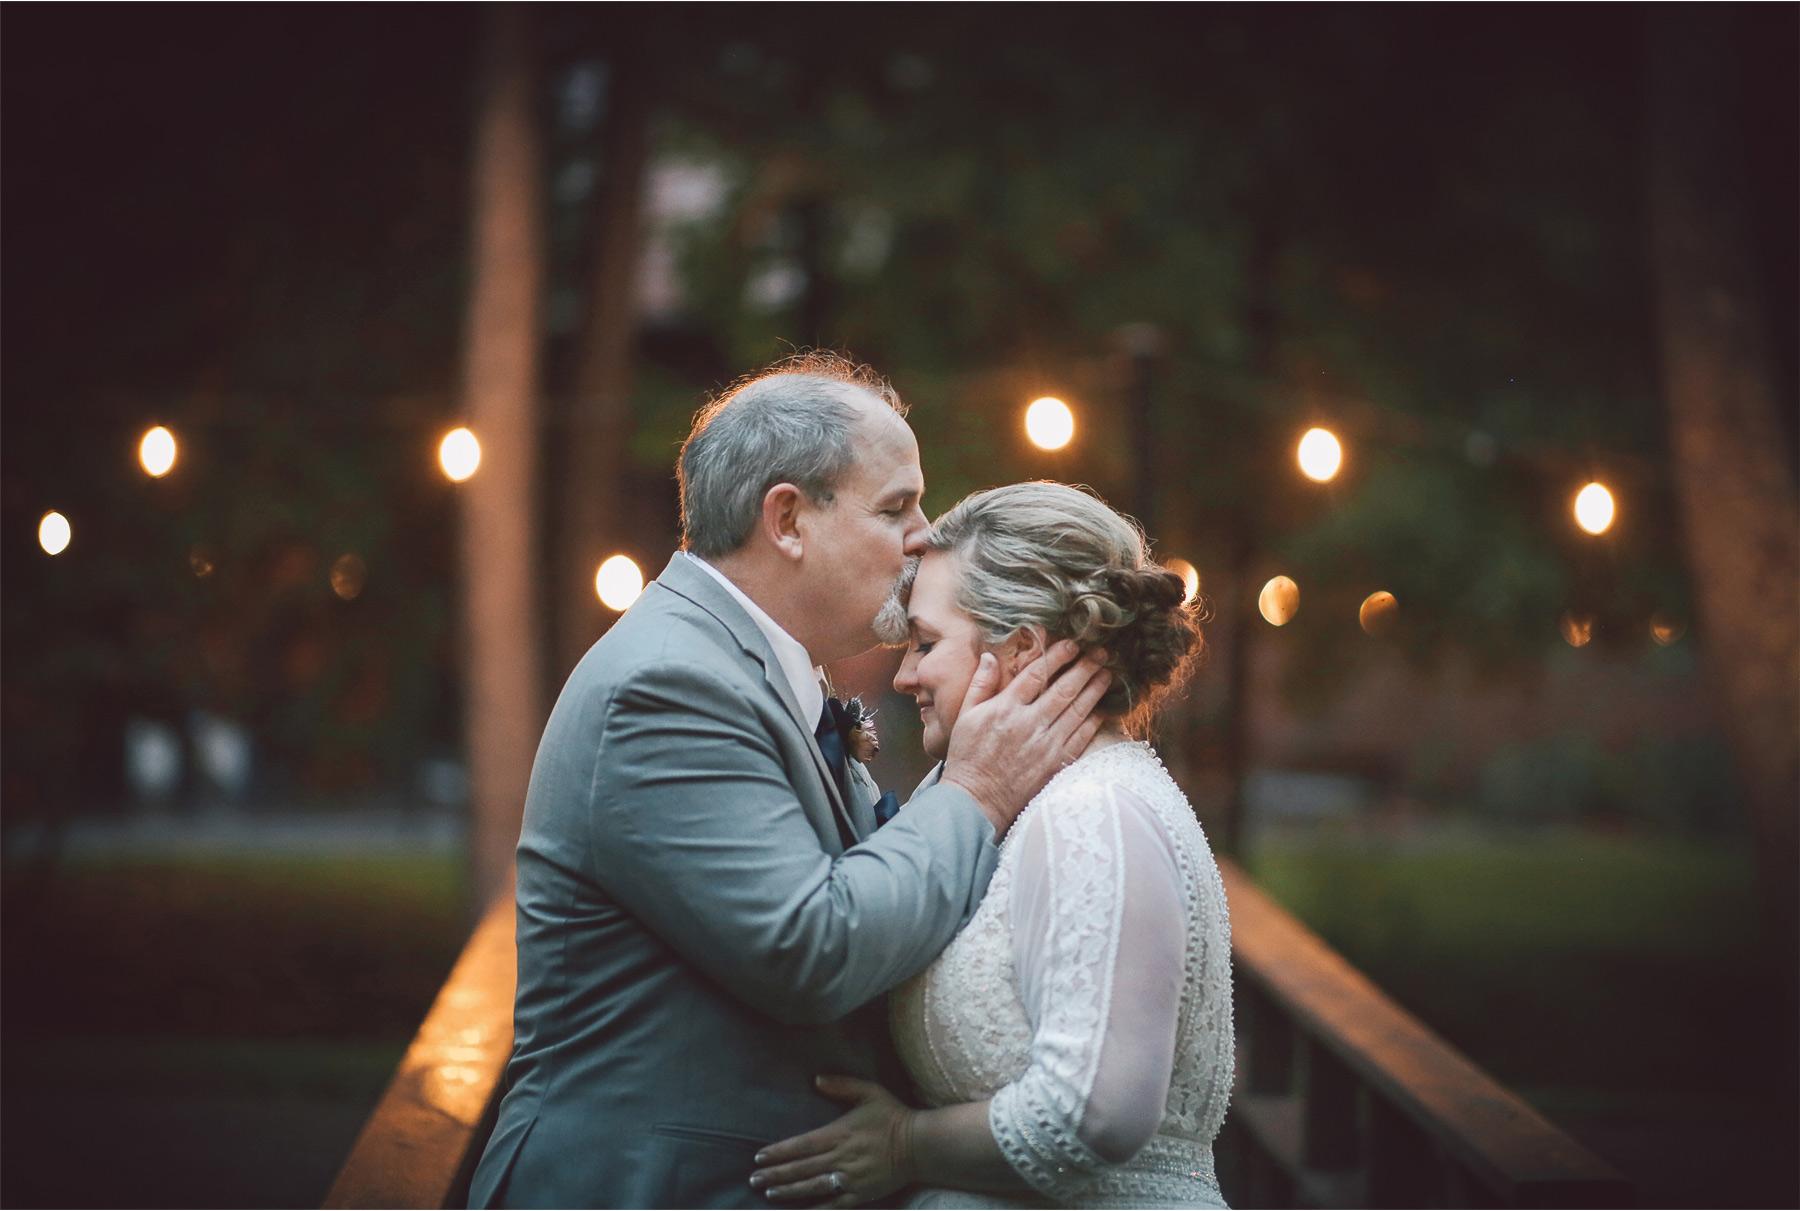 18-Duluth-Minnesota-Wedding-Photography-by-Vick-Photography-Glensheen-Mansion-Kelli-and-Marc.jpg